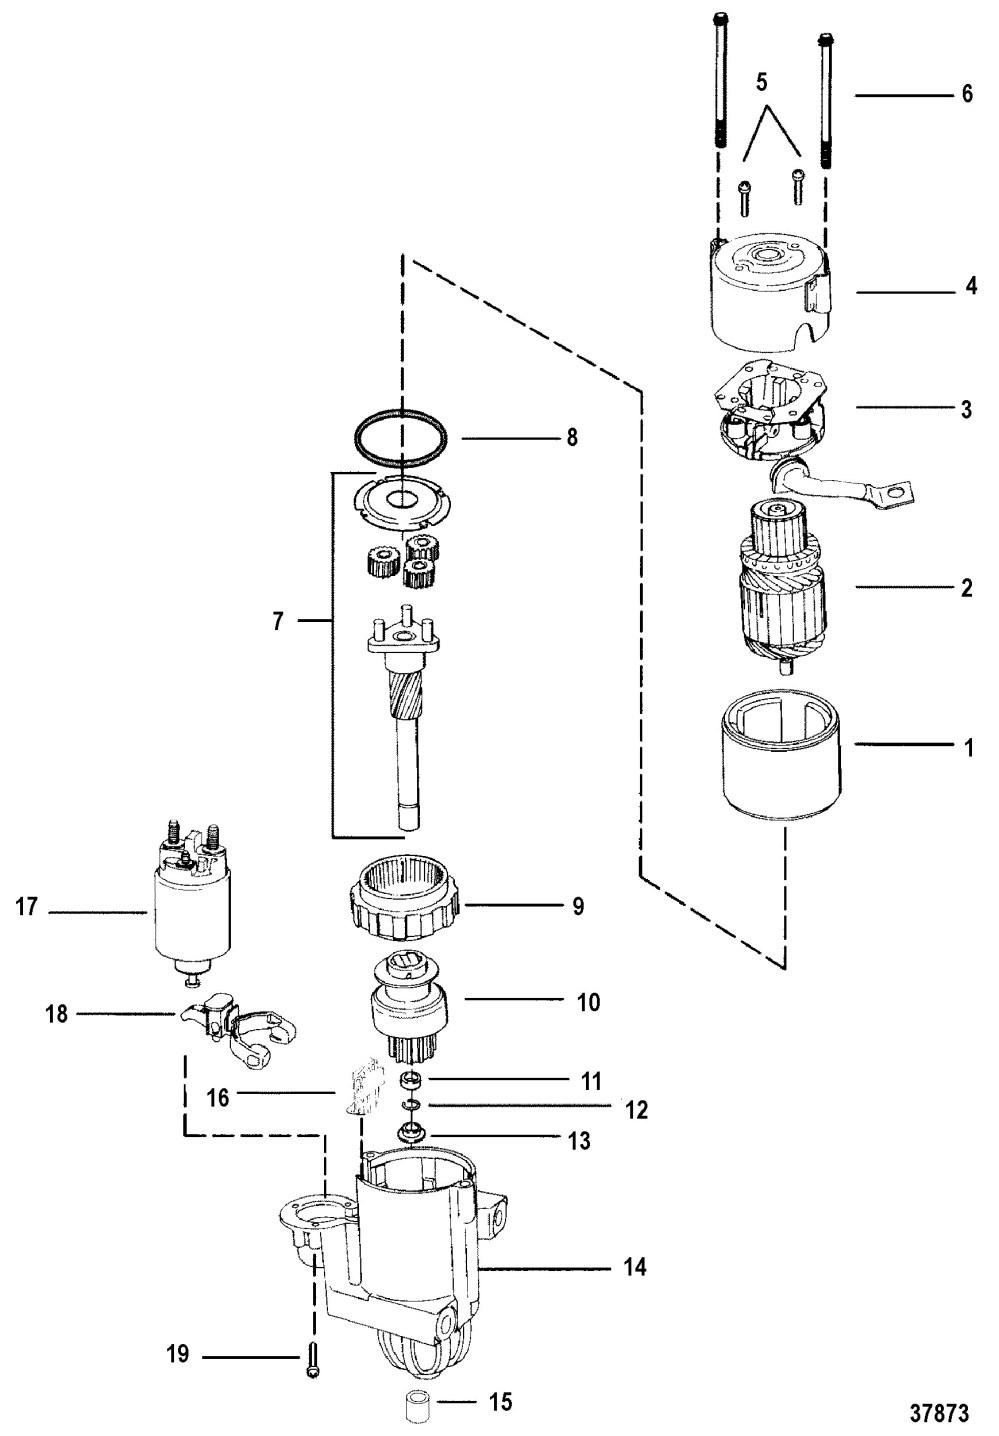 medium resolution of engine diagram 4 3 l mercruiser thunderbolt wiring library 4 3 mercruiser engine diagram my wiring